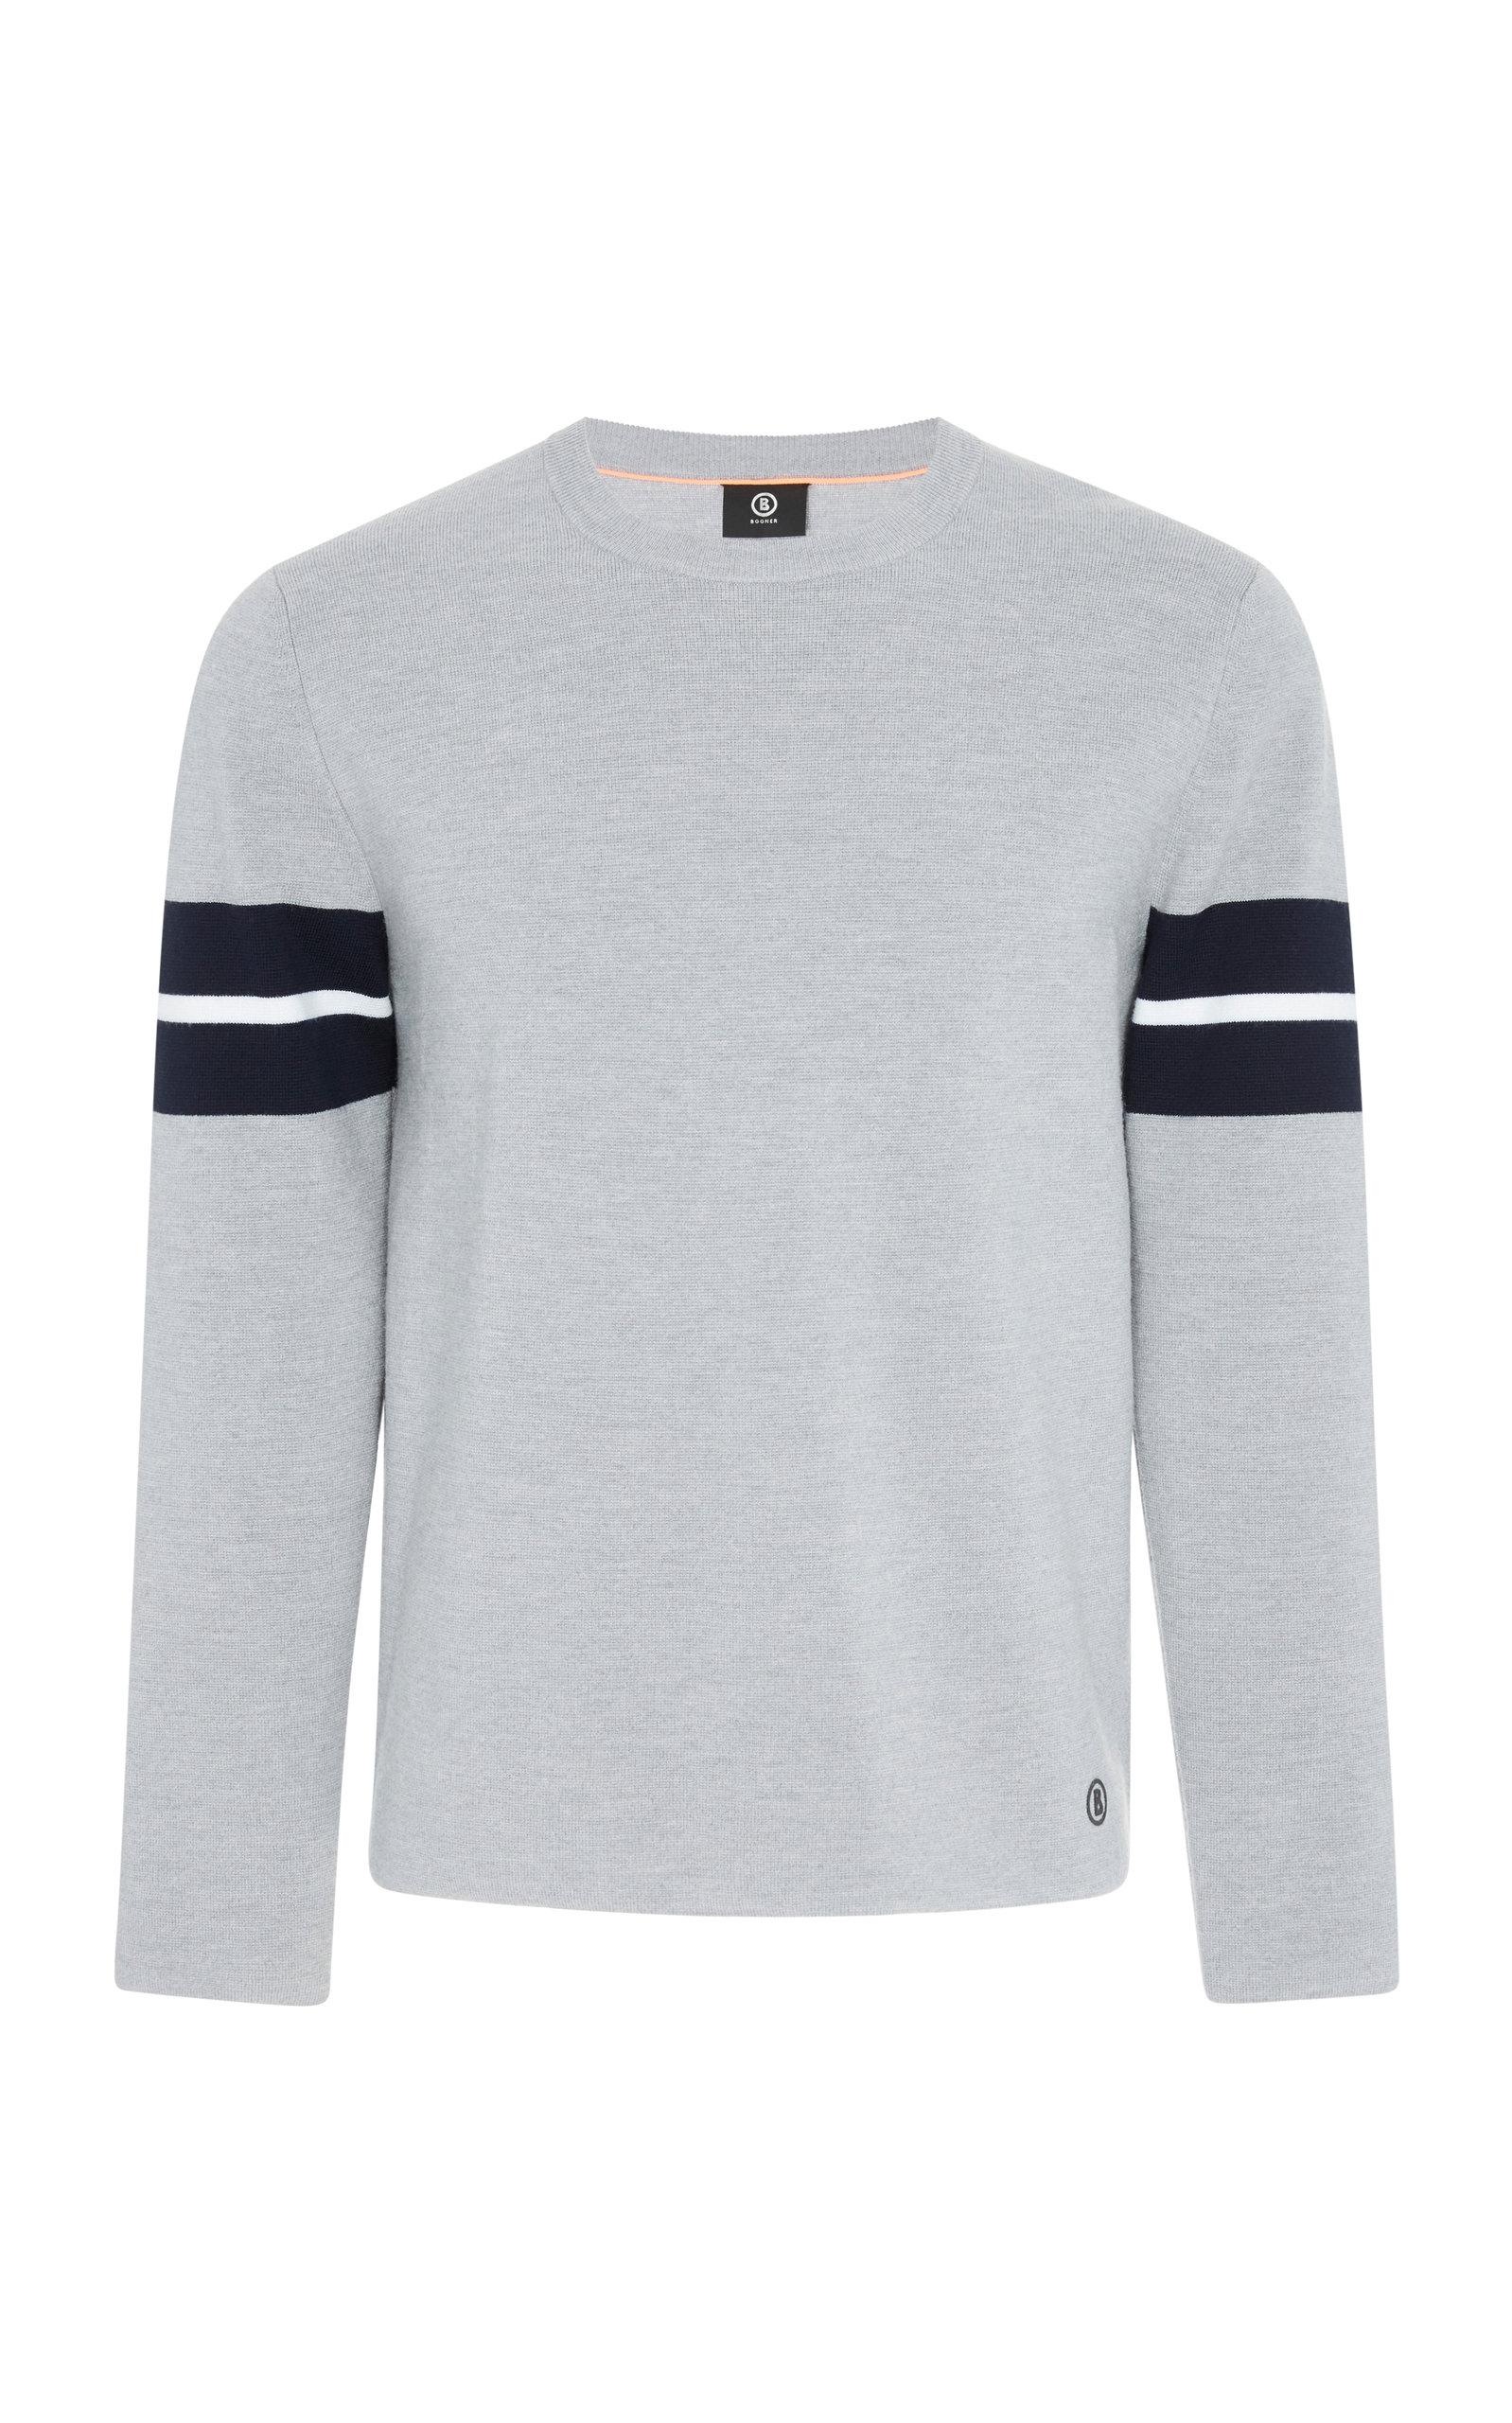 BOGNER X WHITE CUBE Alberto Striped Shirt in Grey